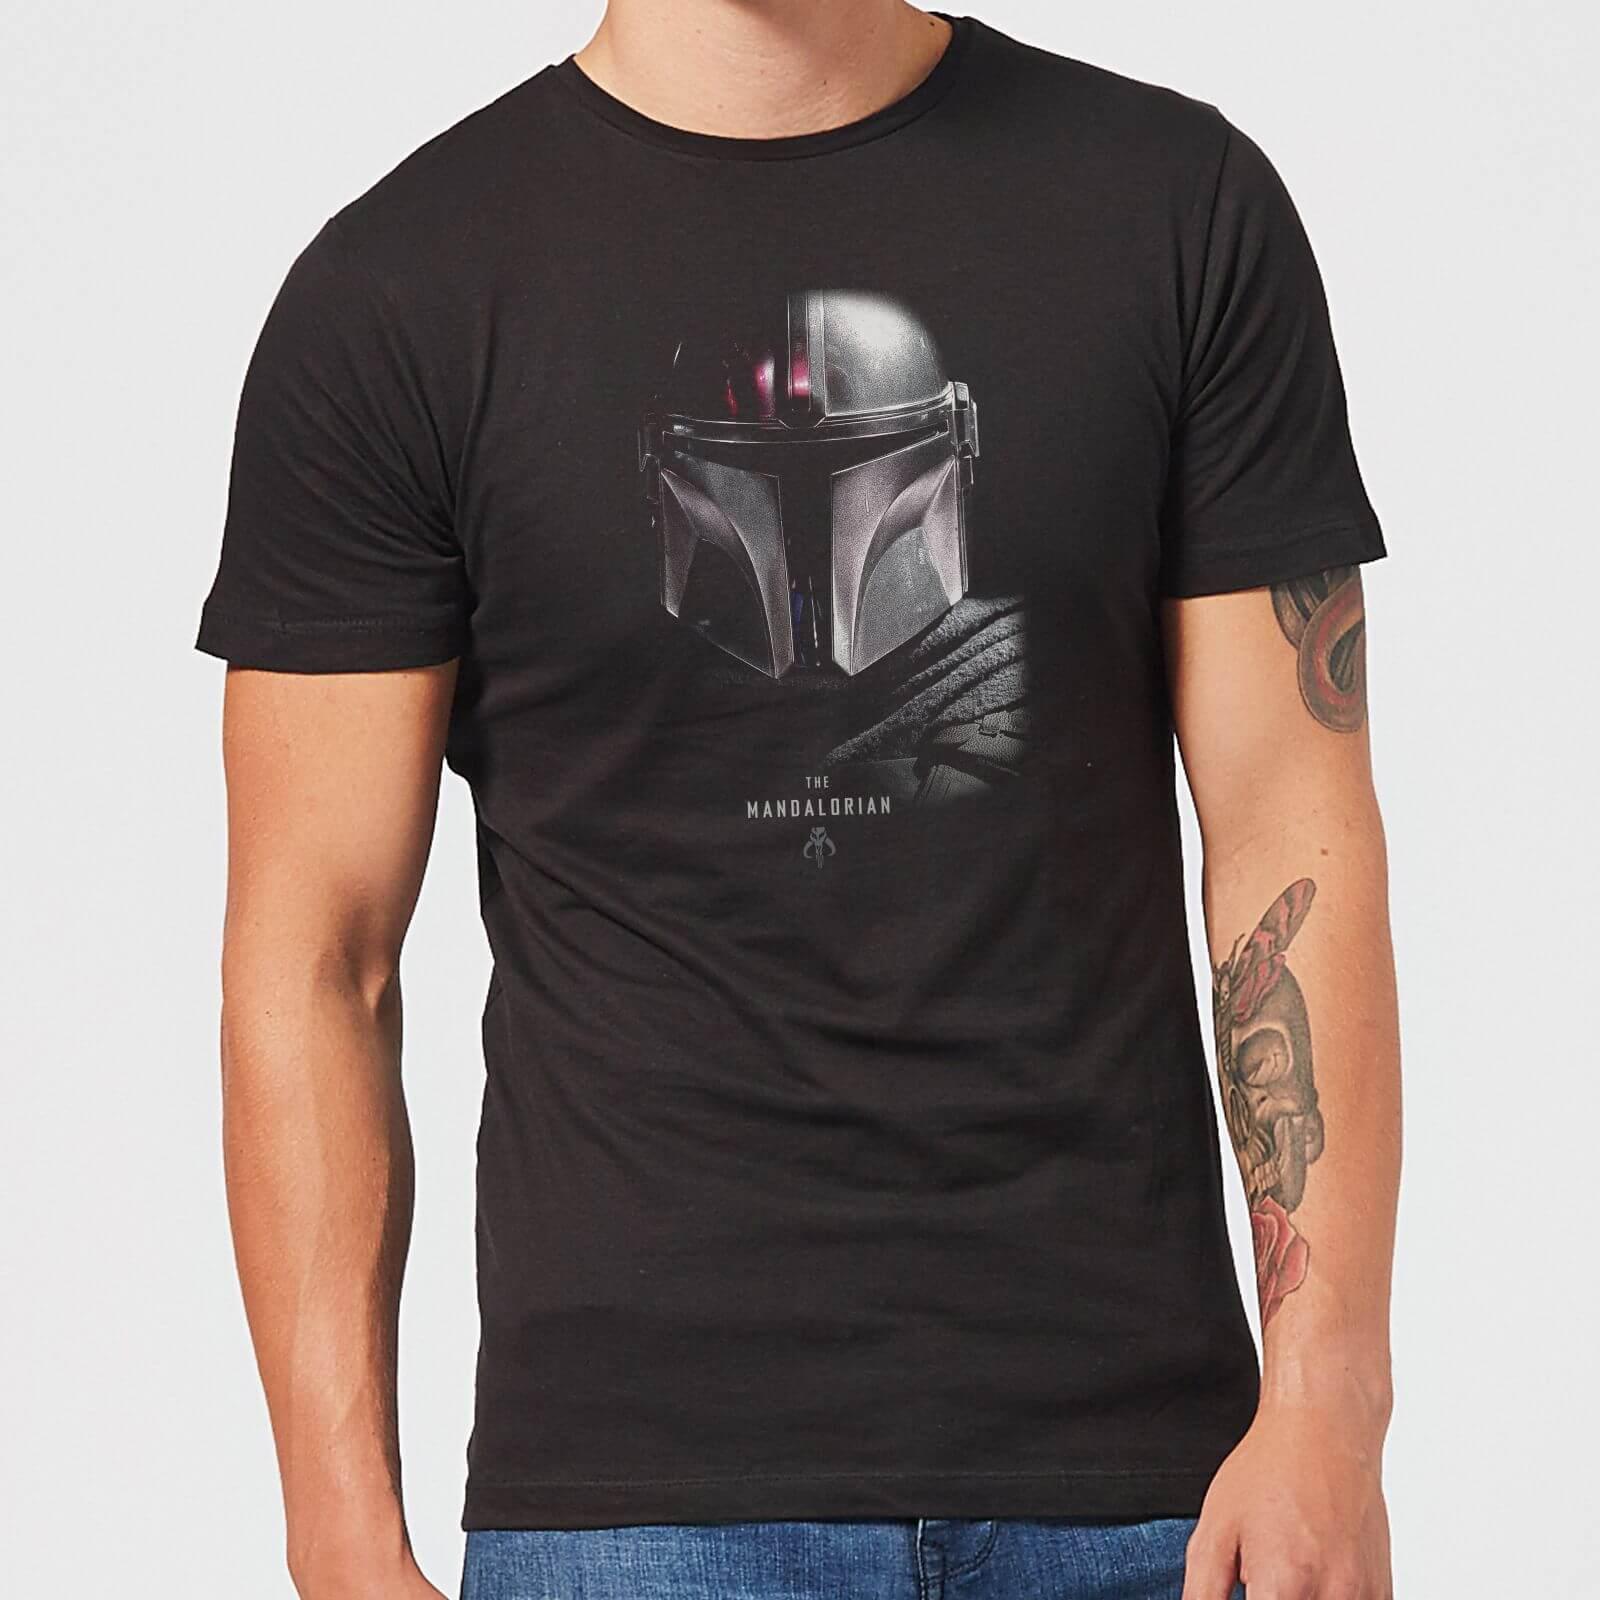 30% korting op officiële Star Wars kleding + gratis verzending @ Zavvi